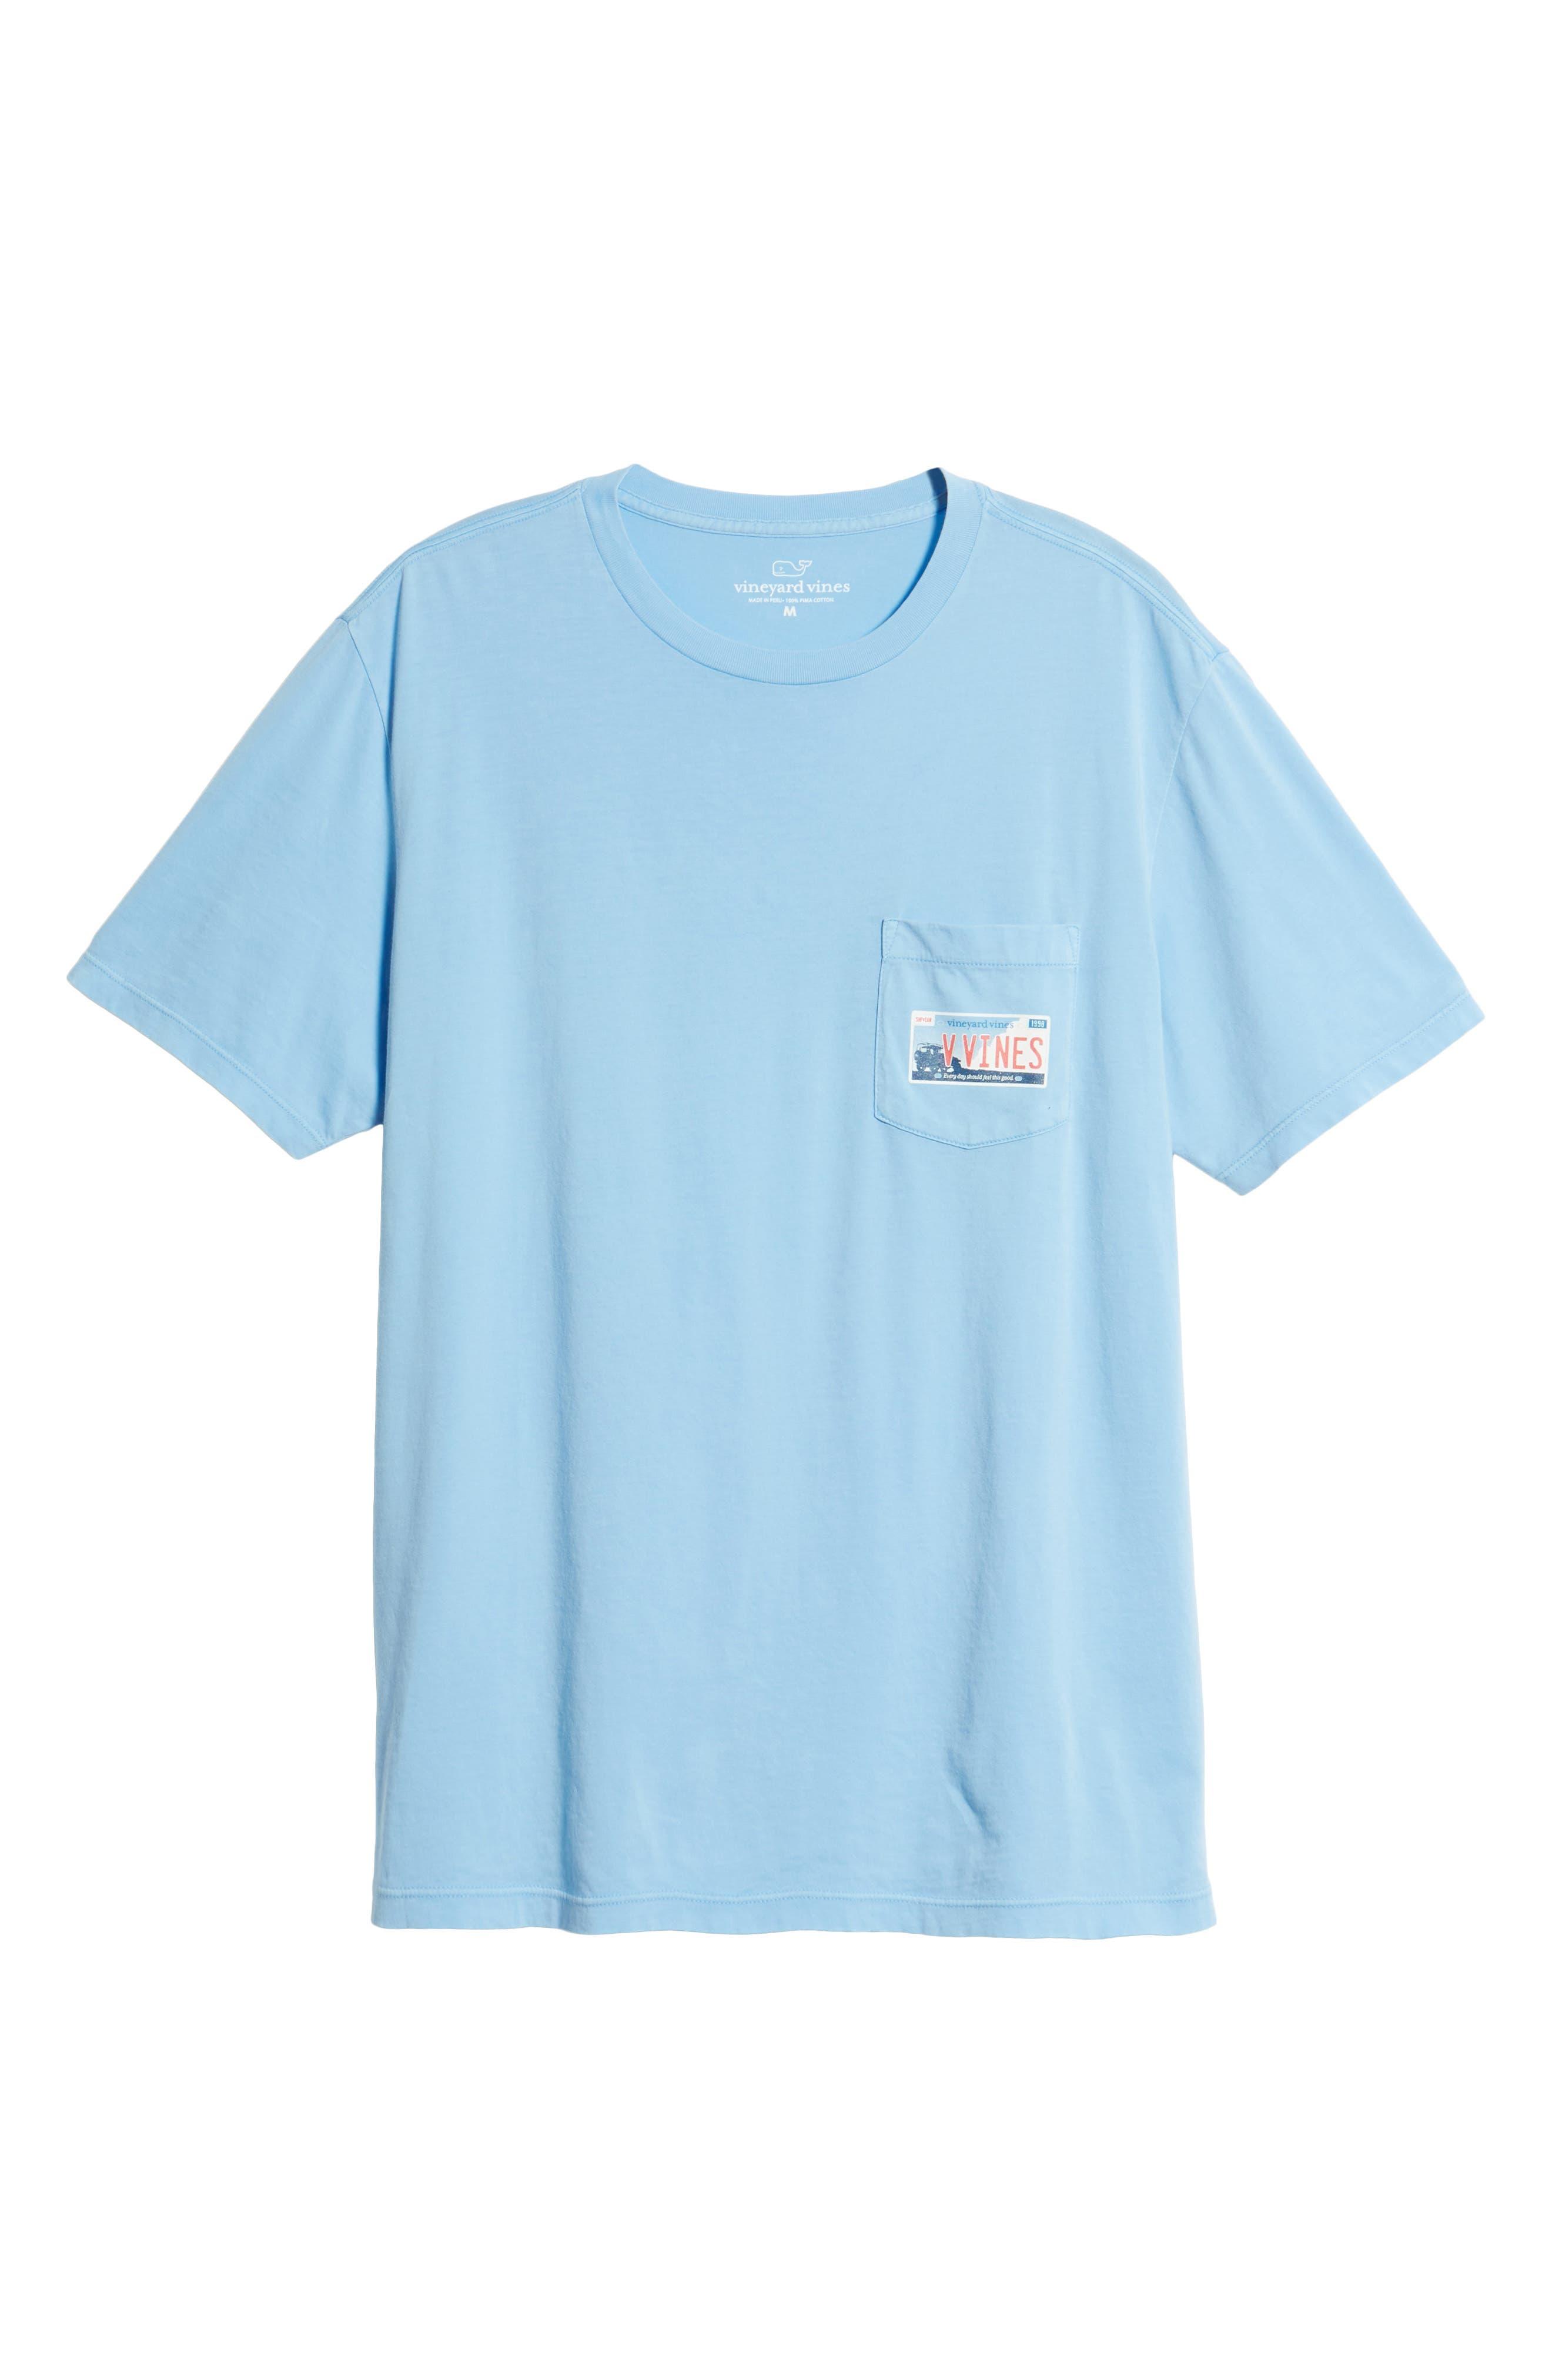 Tie Guys Plate Regular Fit Crewneck T-Shirt,                             Alternate thumbnail 6, color,                             Jake Blue